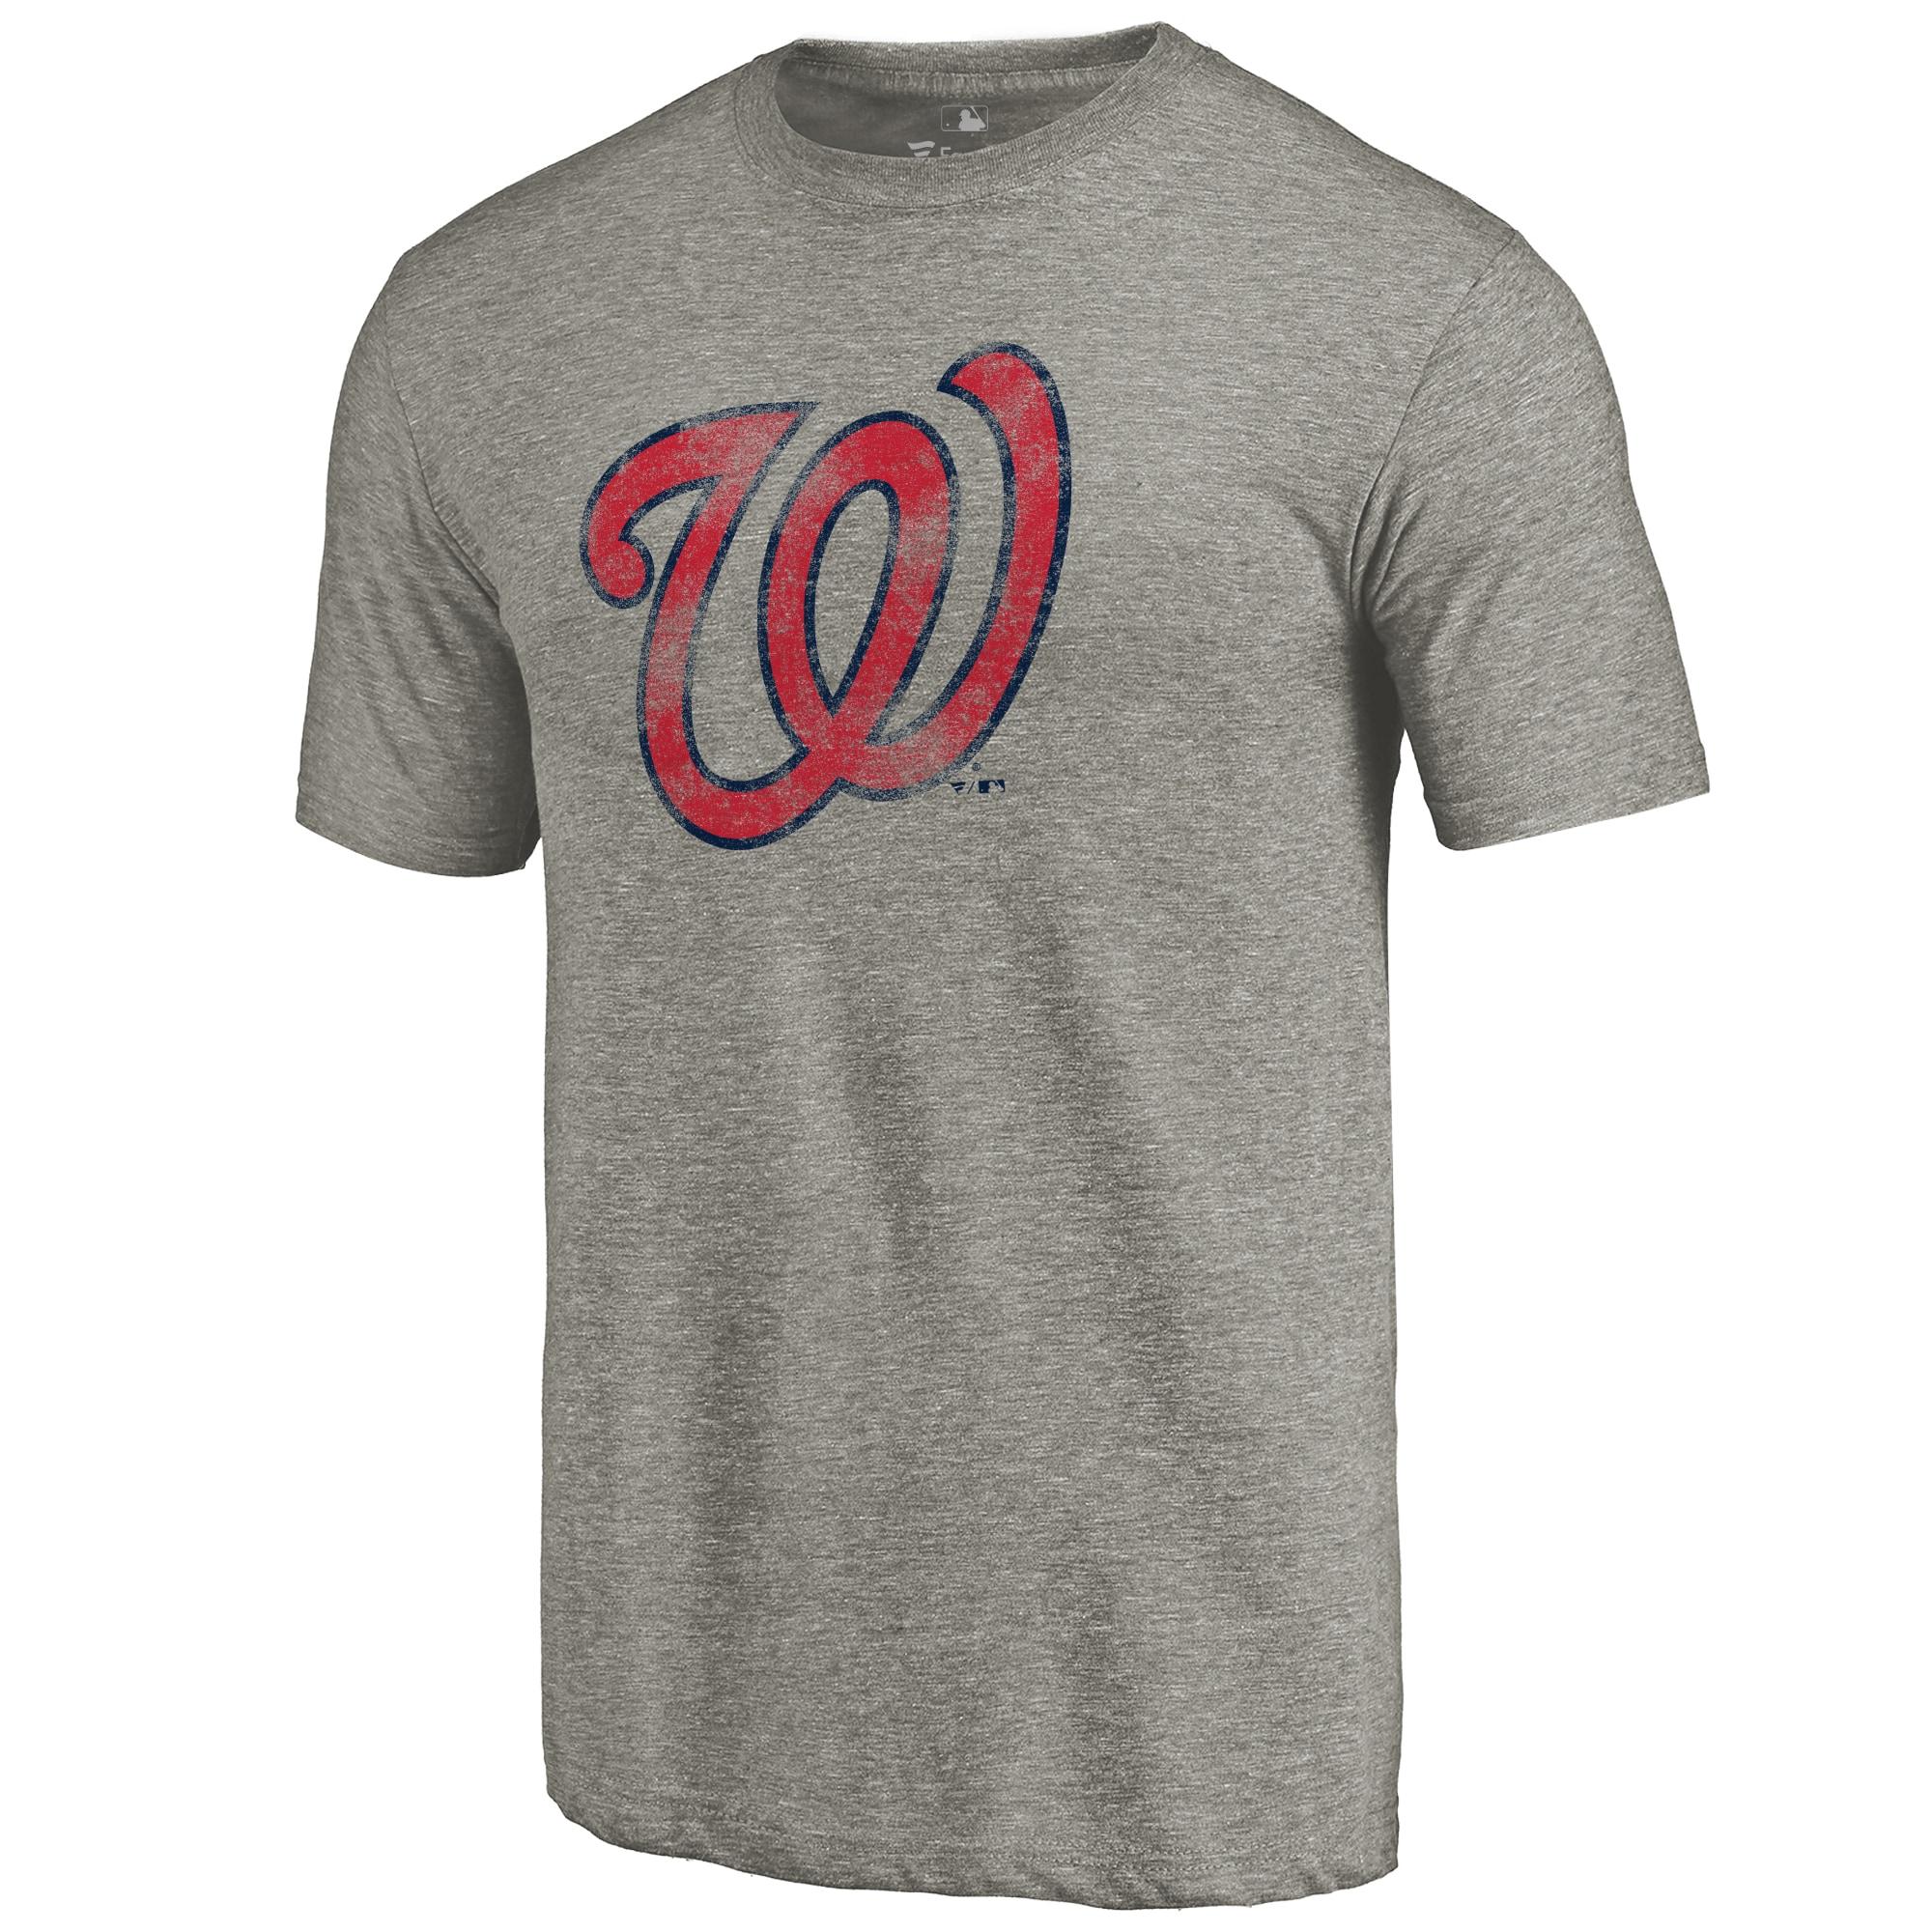 Washington Nationals Distressed Team Tri-Blend T-Shirt - Ash